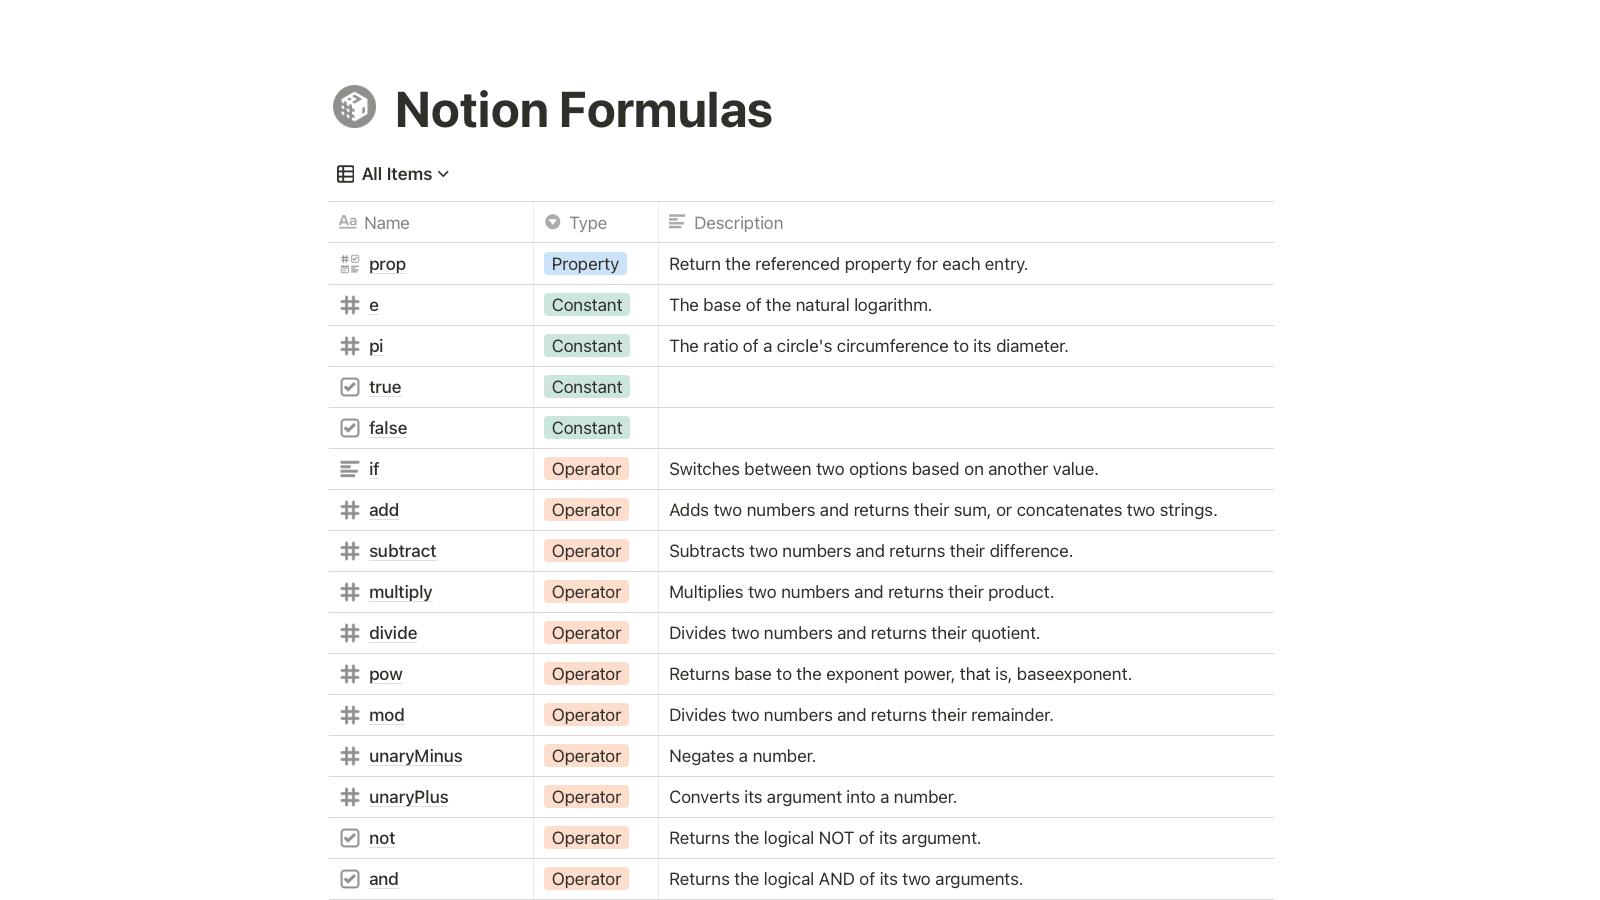 Notion Formulas